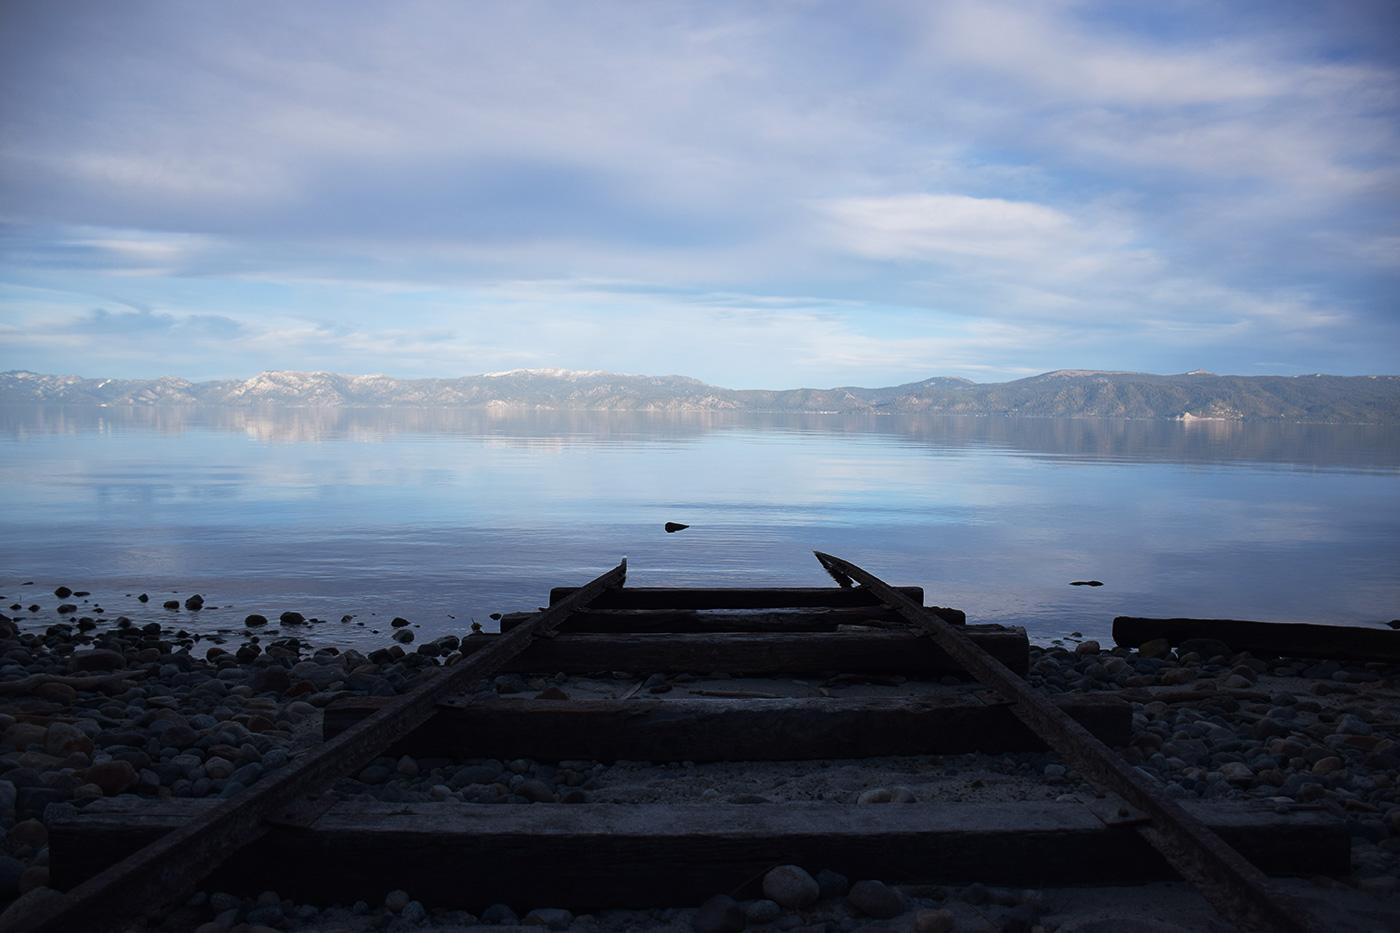 lake-tahoe-sugar-pine-point-hike-old-boat-tracks.jpg